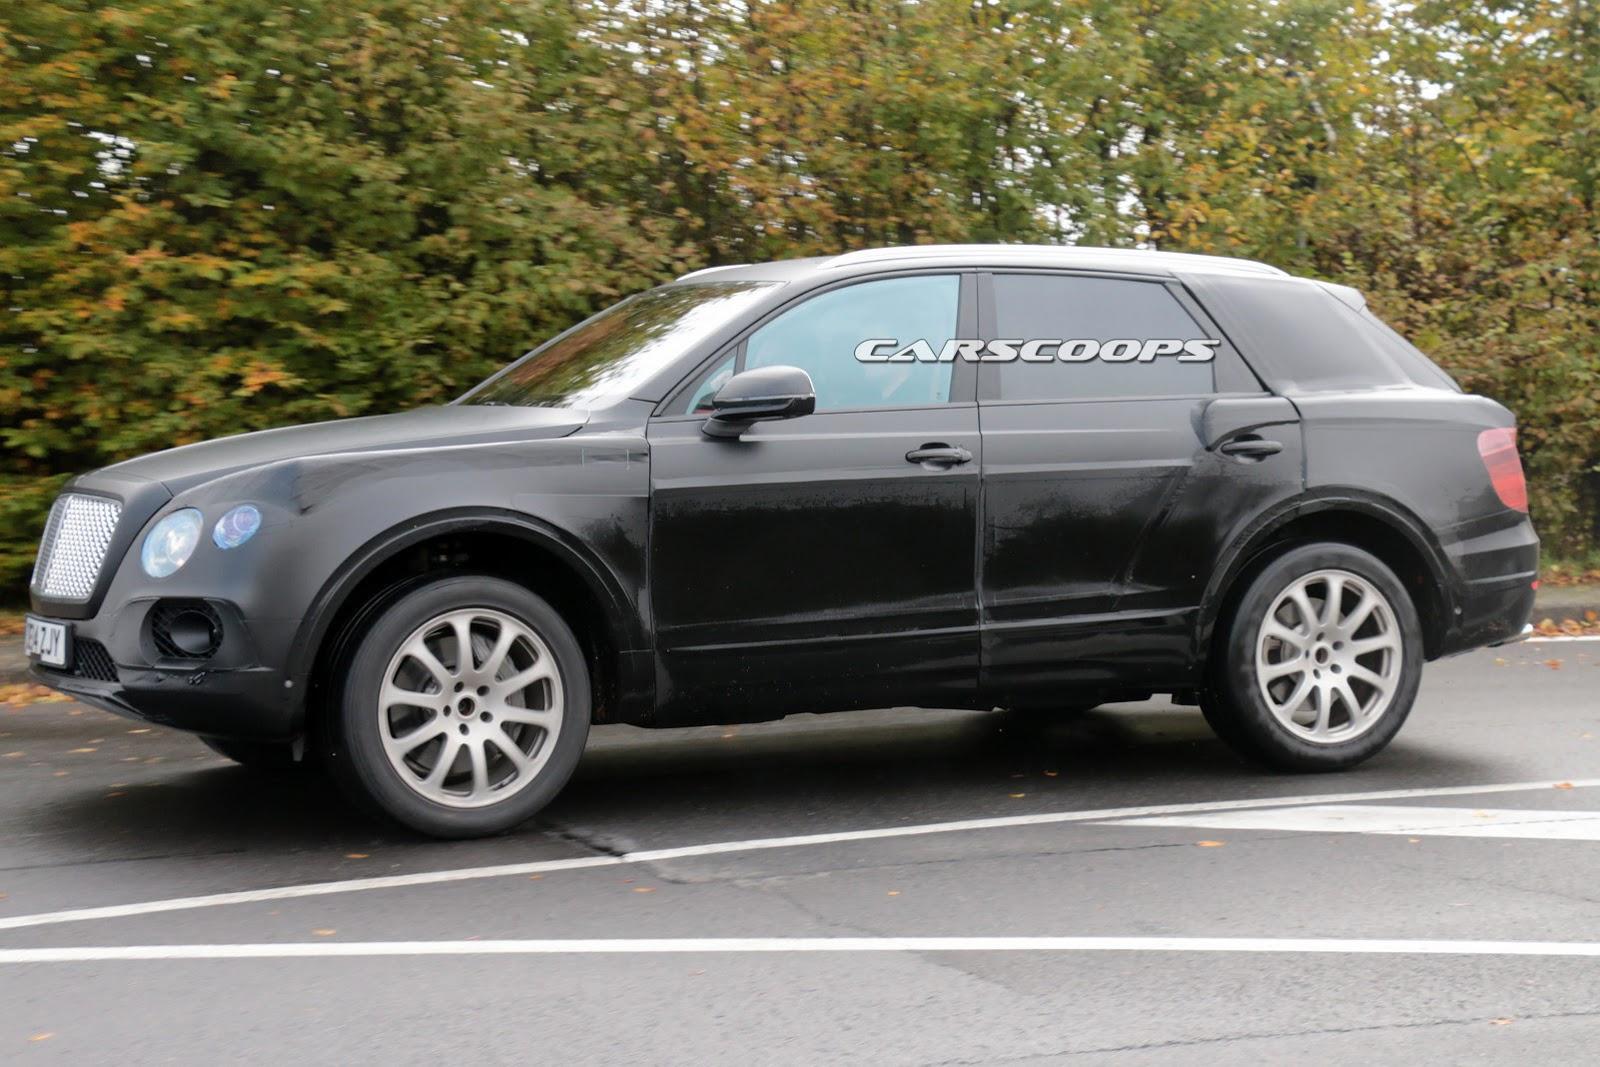 Bentley S 2017 Suv Spied Testing With 6 0 Liter W12 Engine